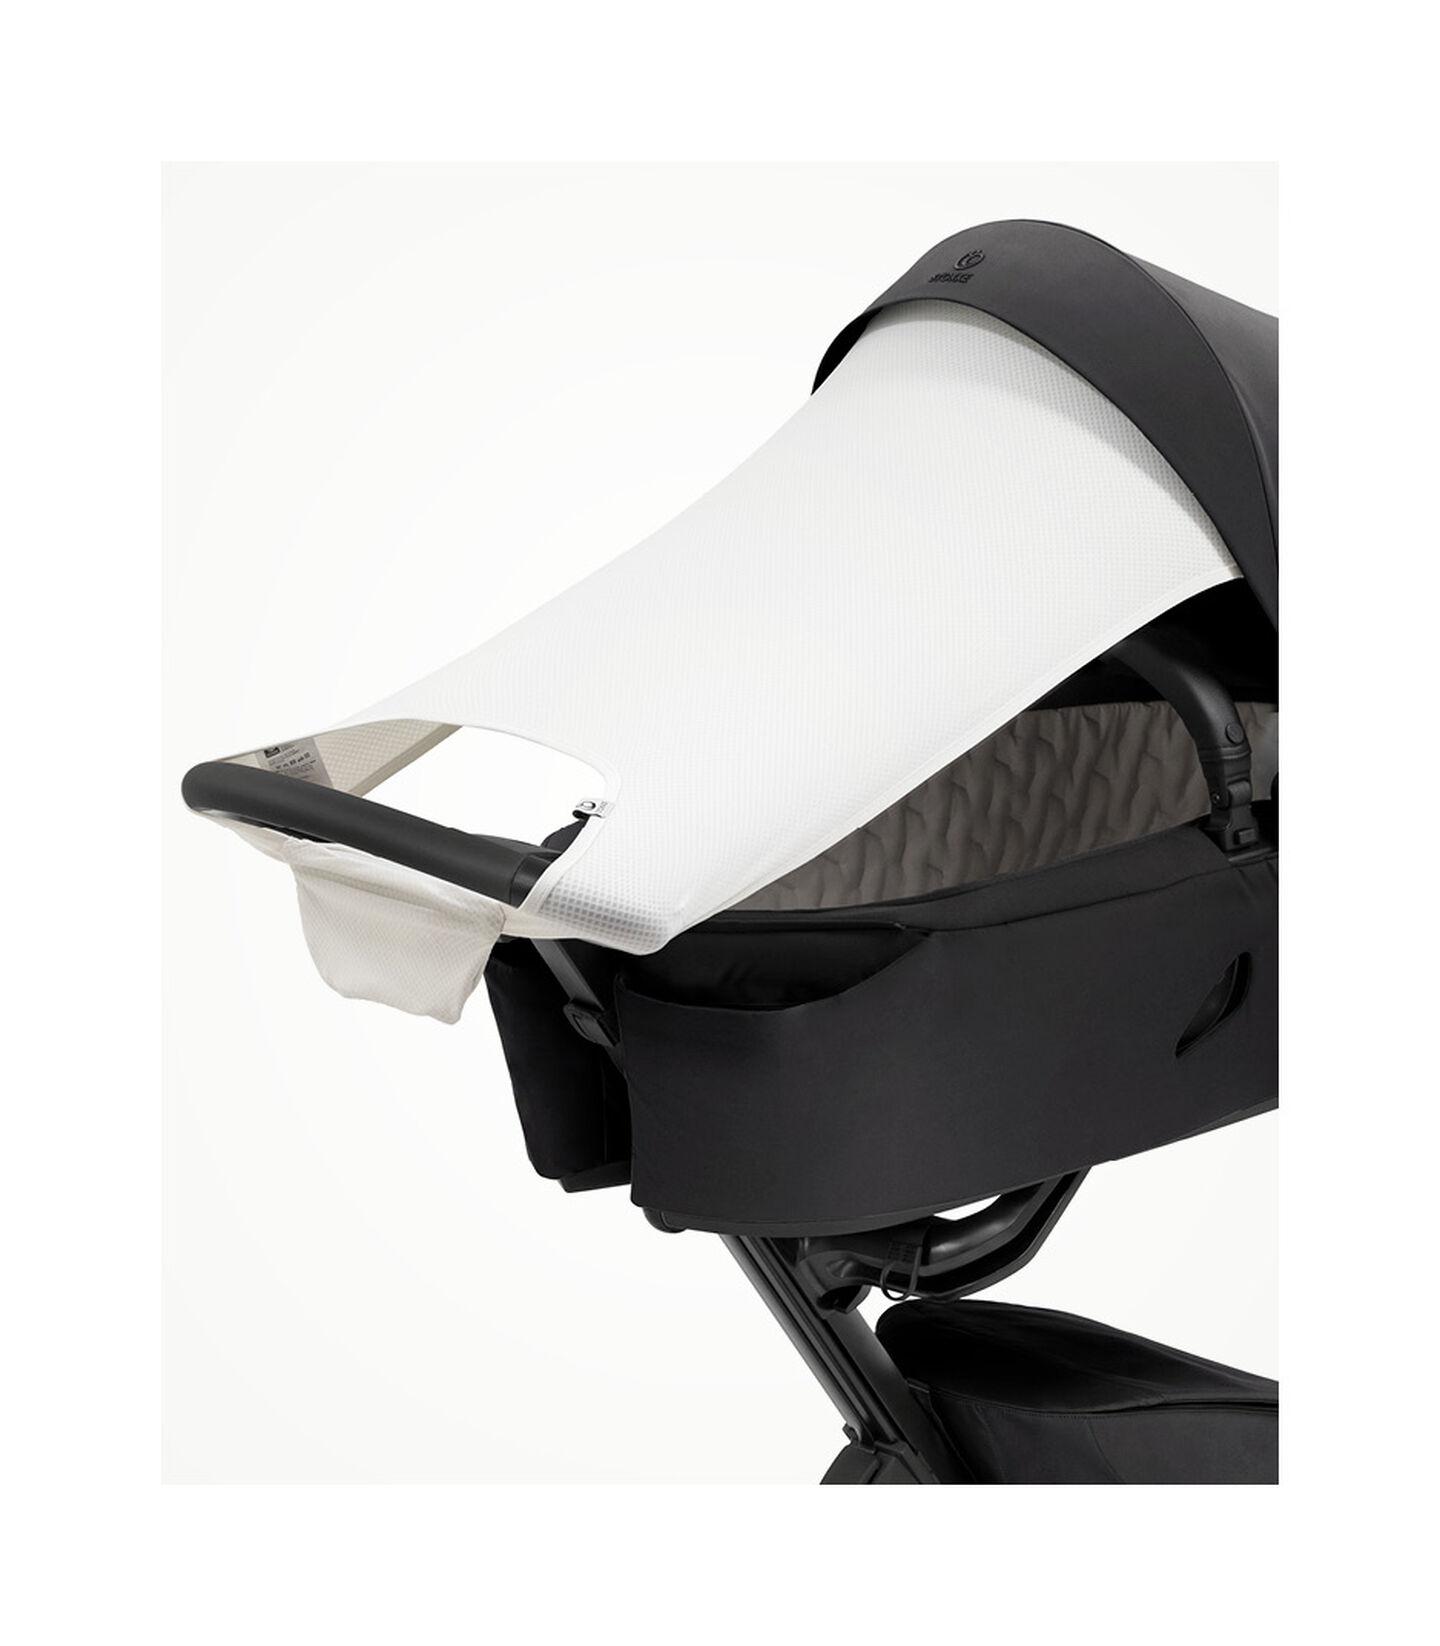 Stokke® Xplory® X Sonnensegel Light Grey, Light Grey, mainview view 2